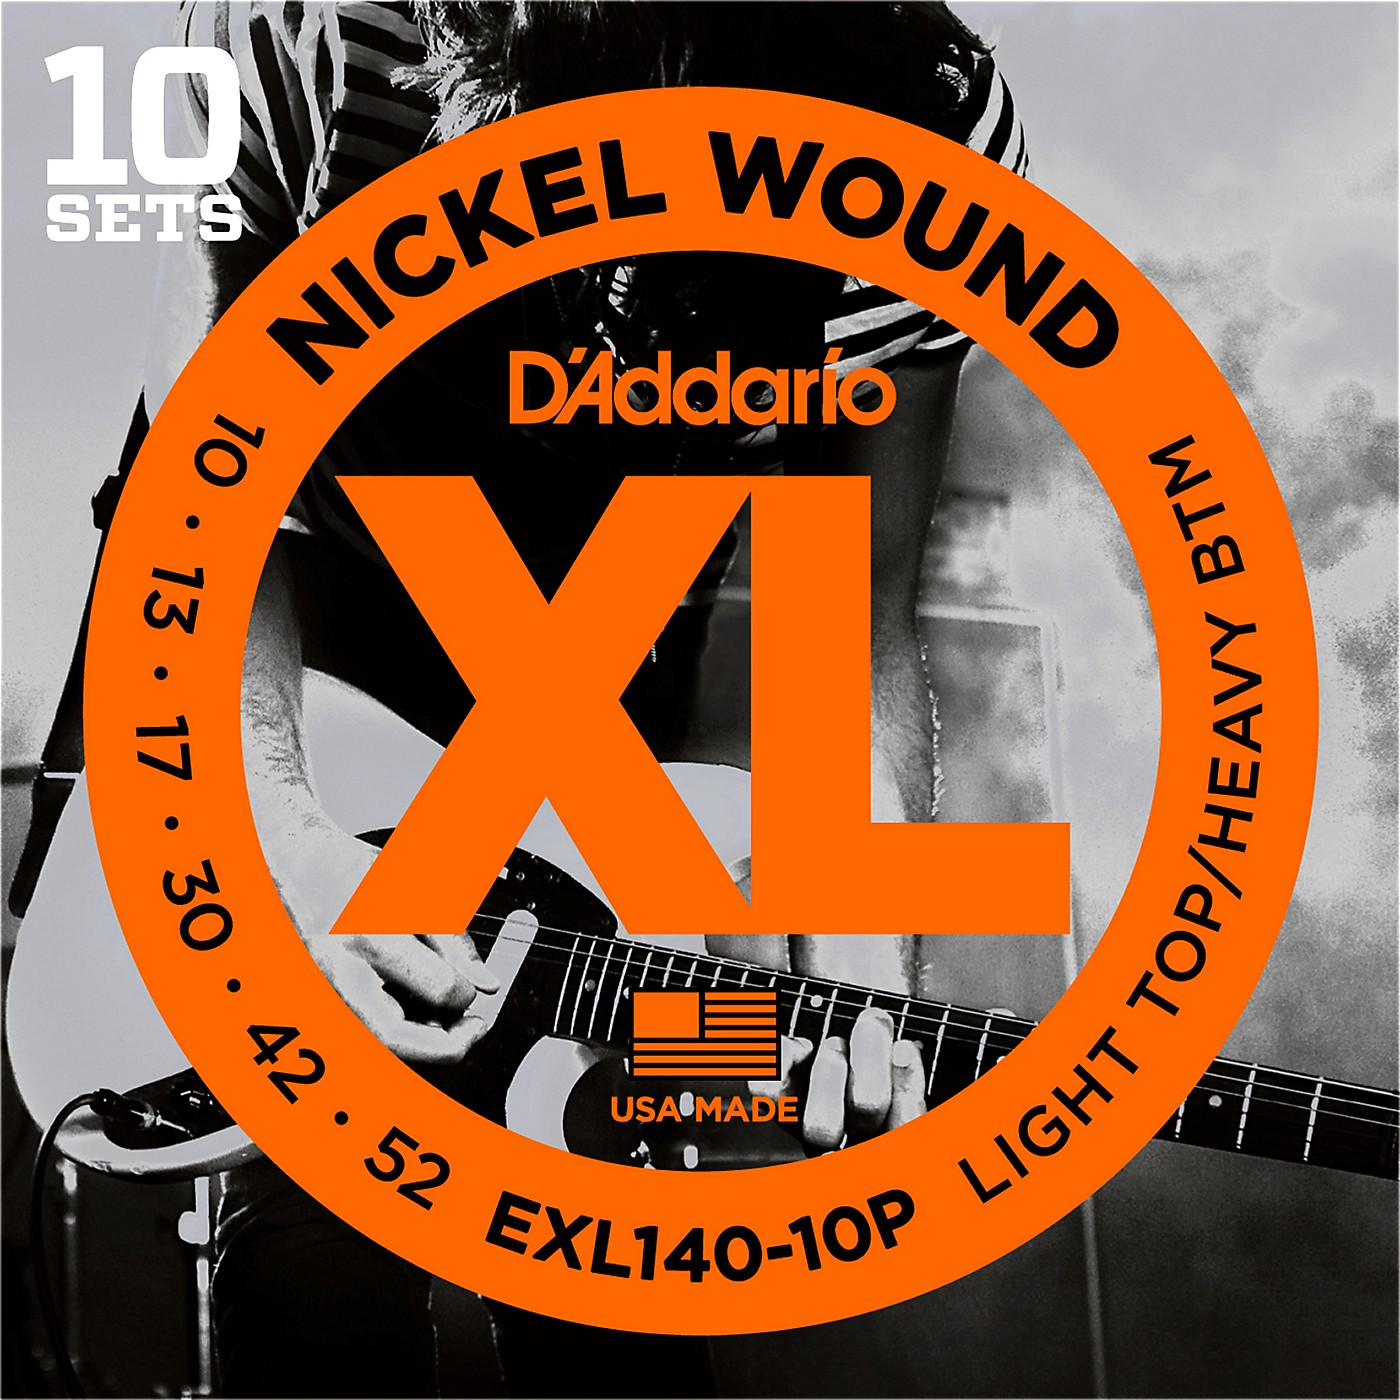 D'Addario EXL140 Light Top/Heavy Bottom Electric Guitar Strings 10-Pack thumbnail